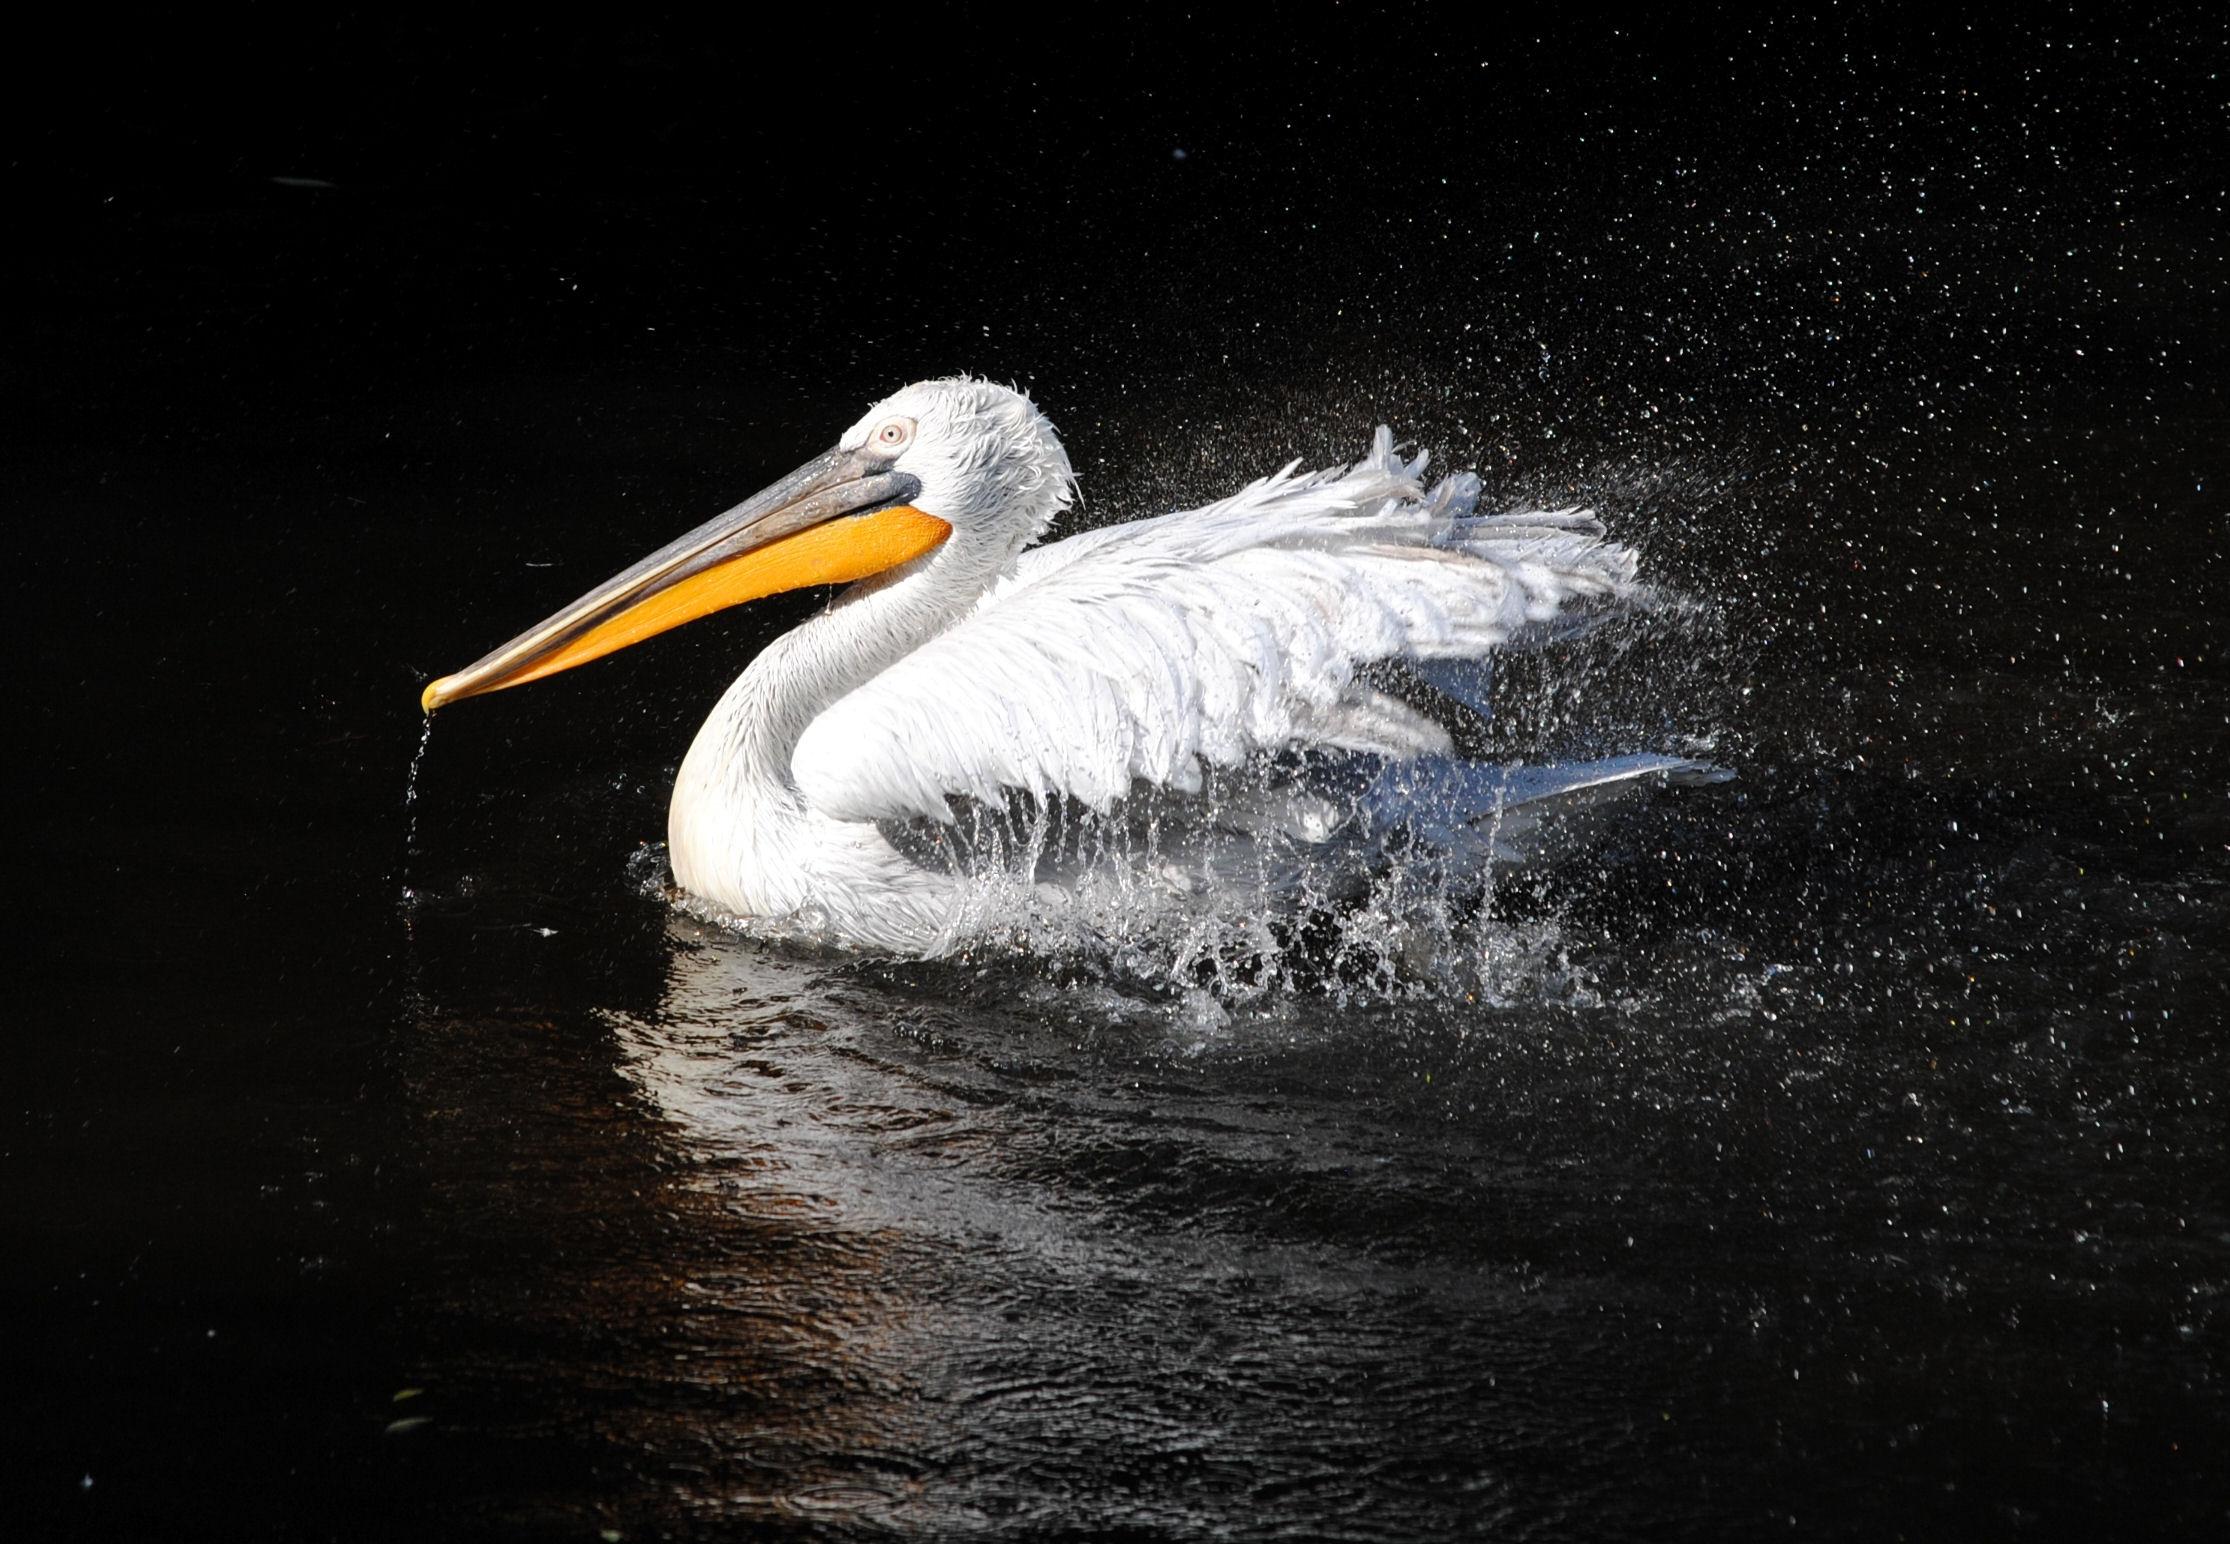 91369 download wallpaper Animals, Pelican, Bird, To Swim, Swim, Black Background, Beak, Spray screensavers and pictures for free